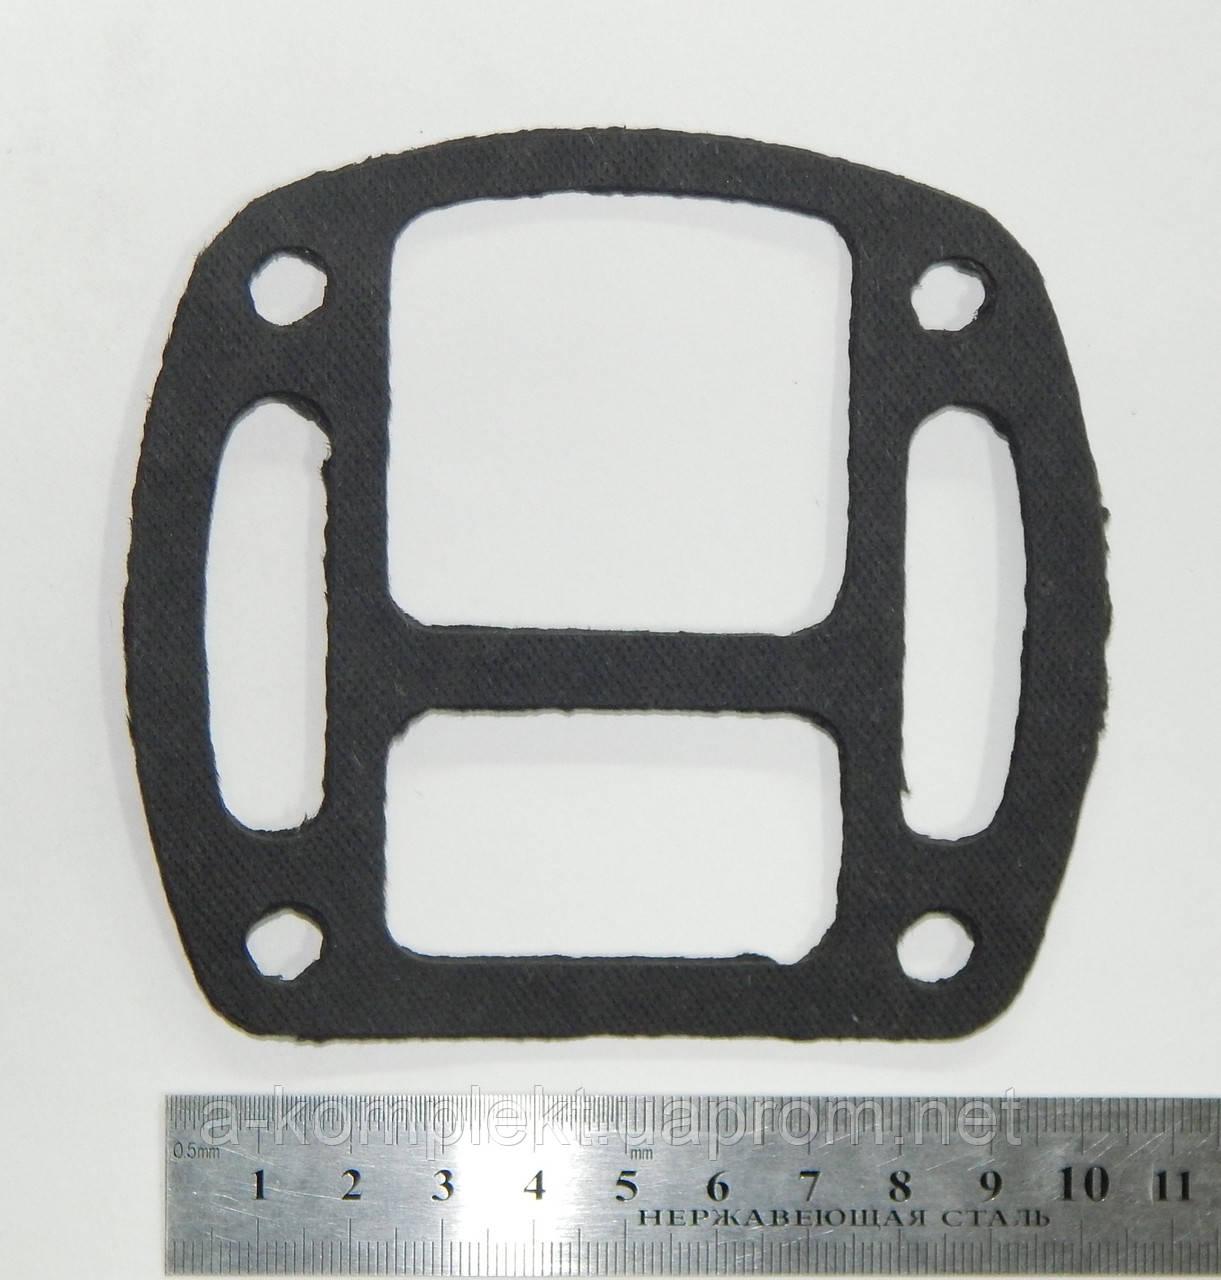 Прокладка водяной головки компрессора МТЗ, ЗИЛ